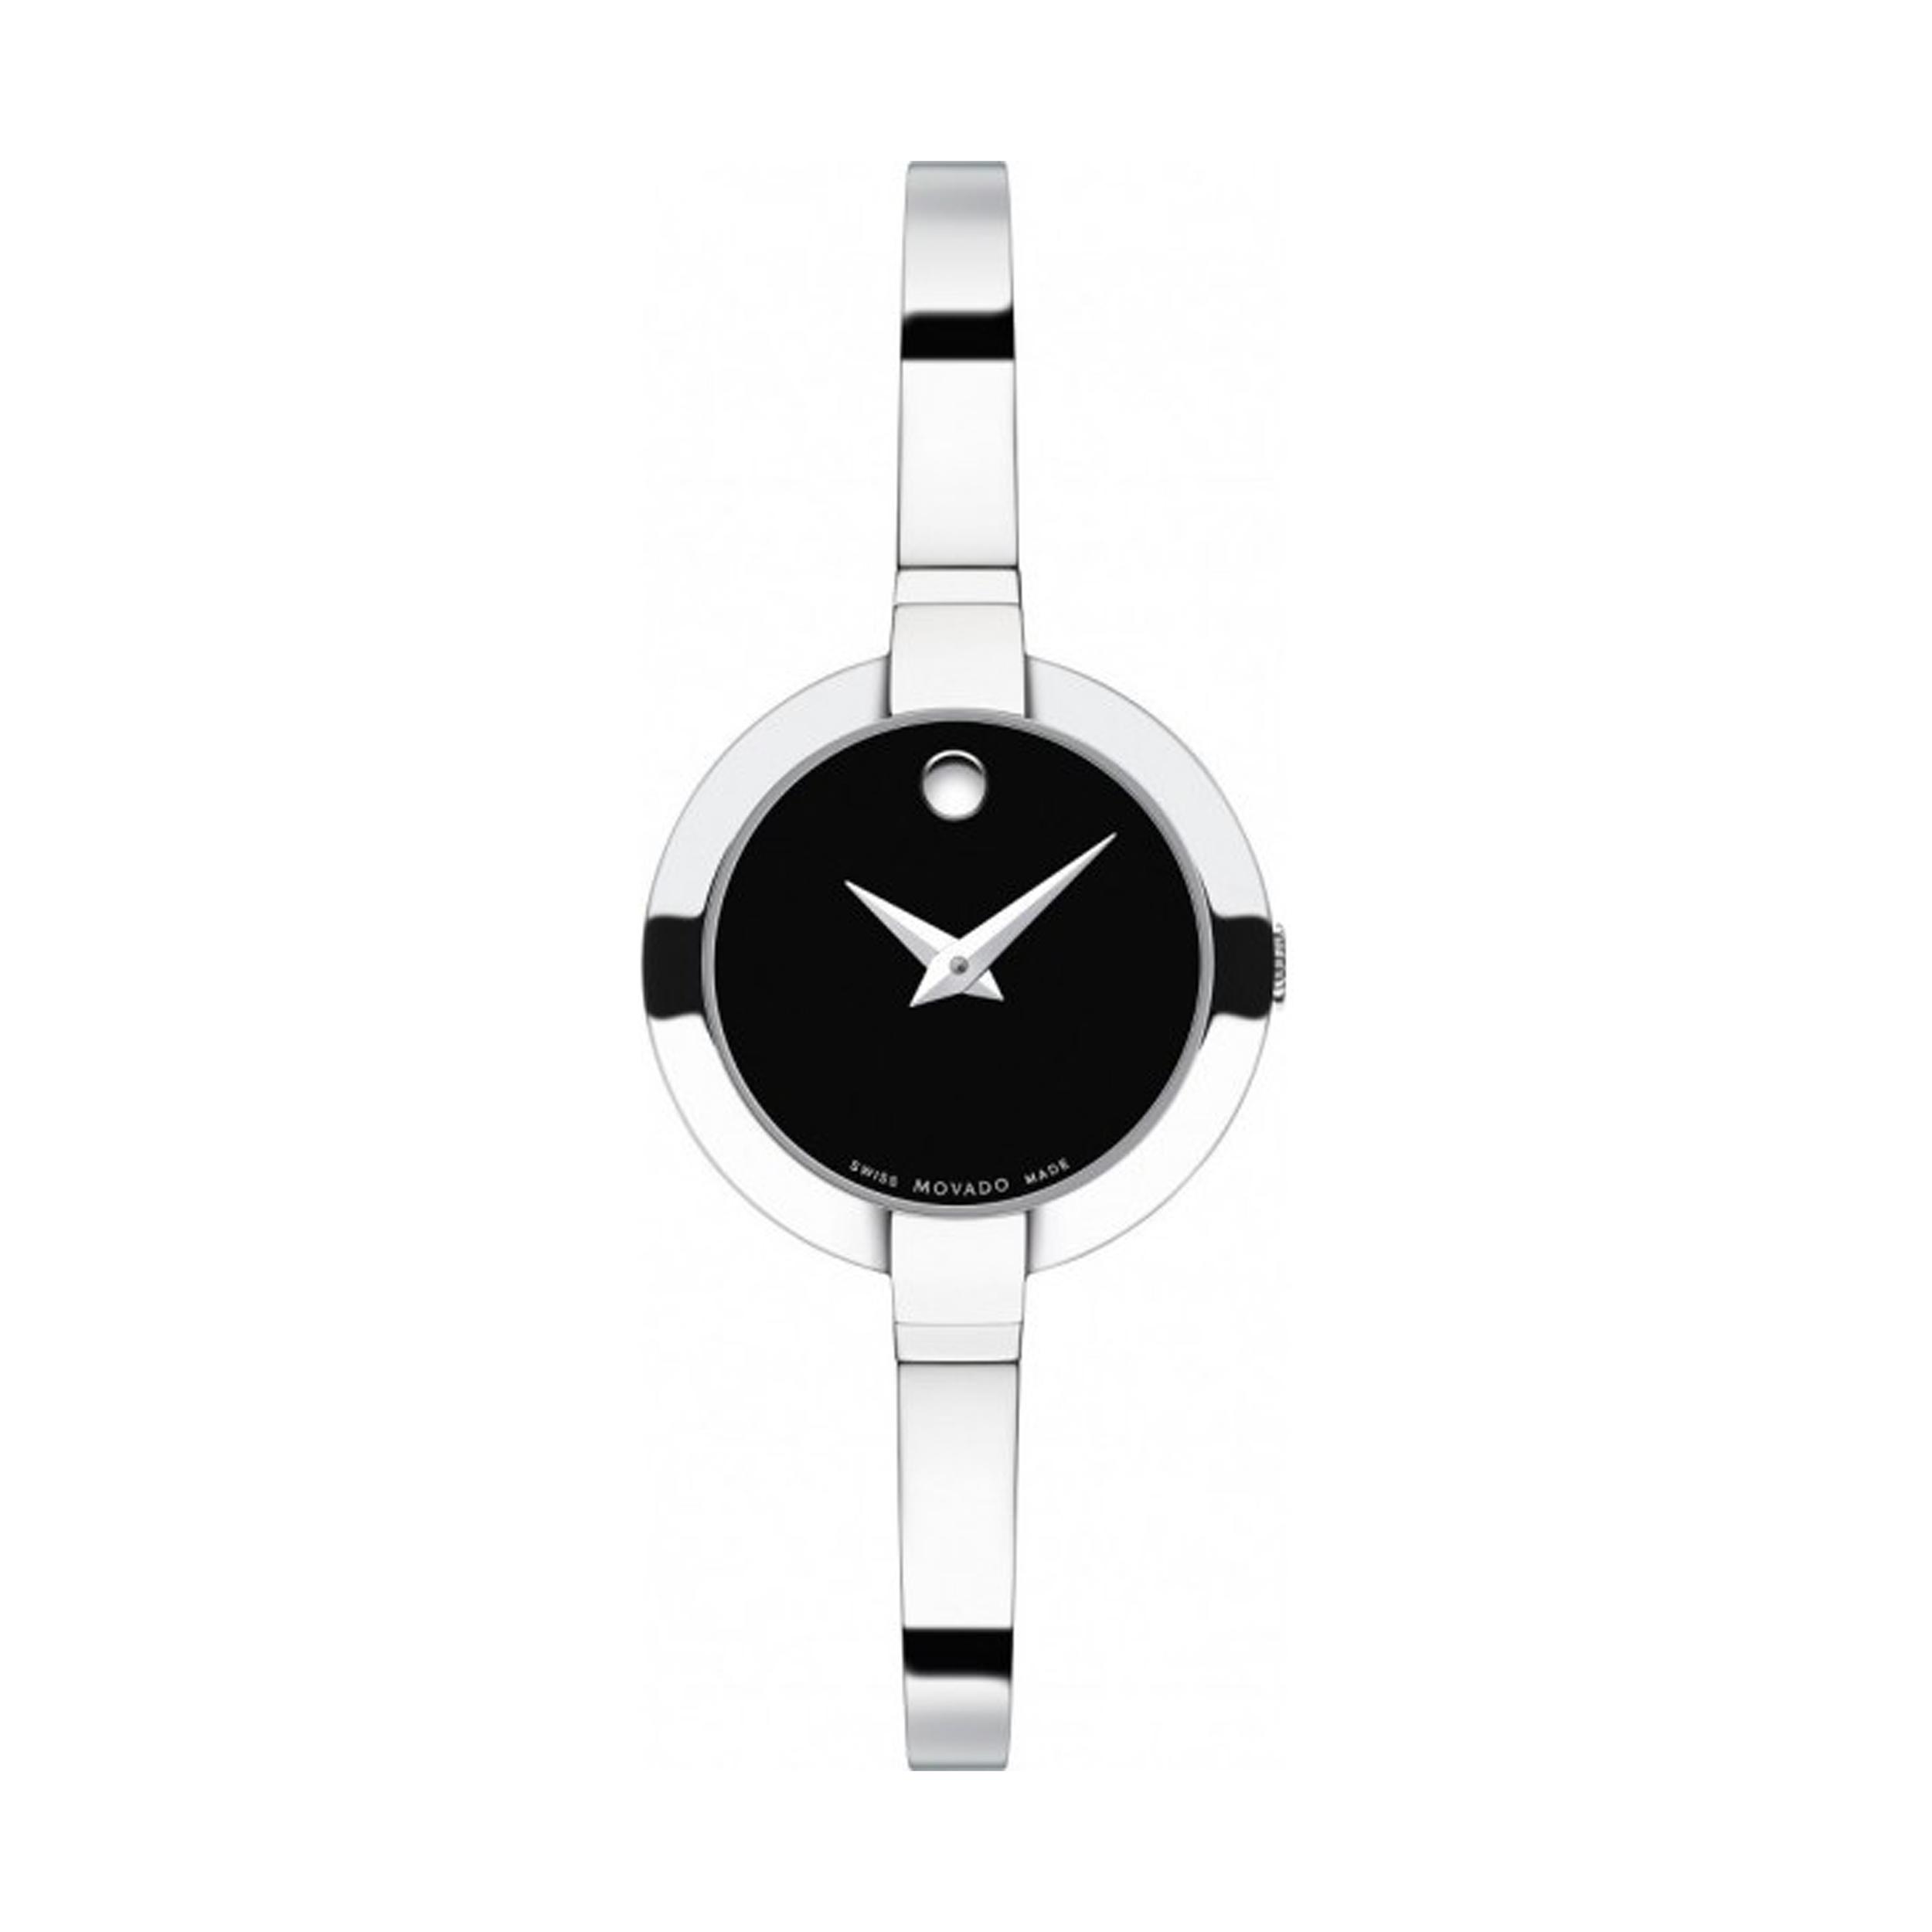 ساعت  زنانه موادو مدل 0606595